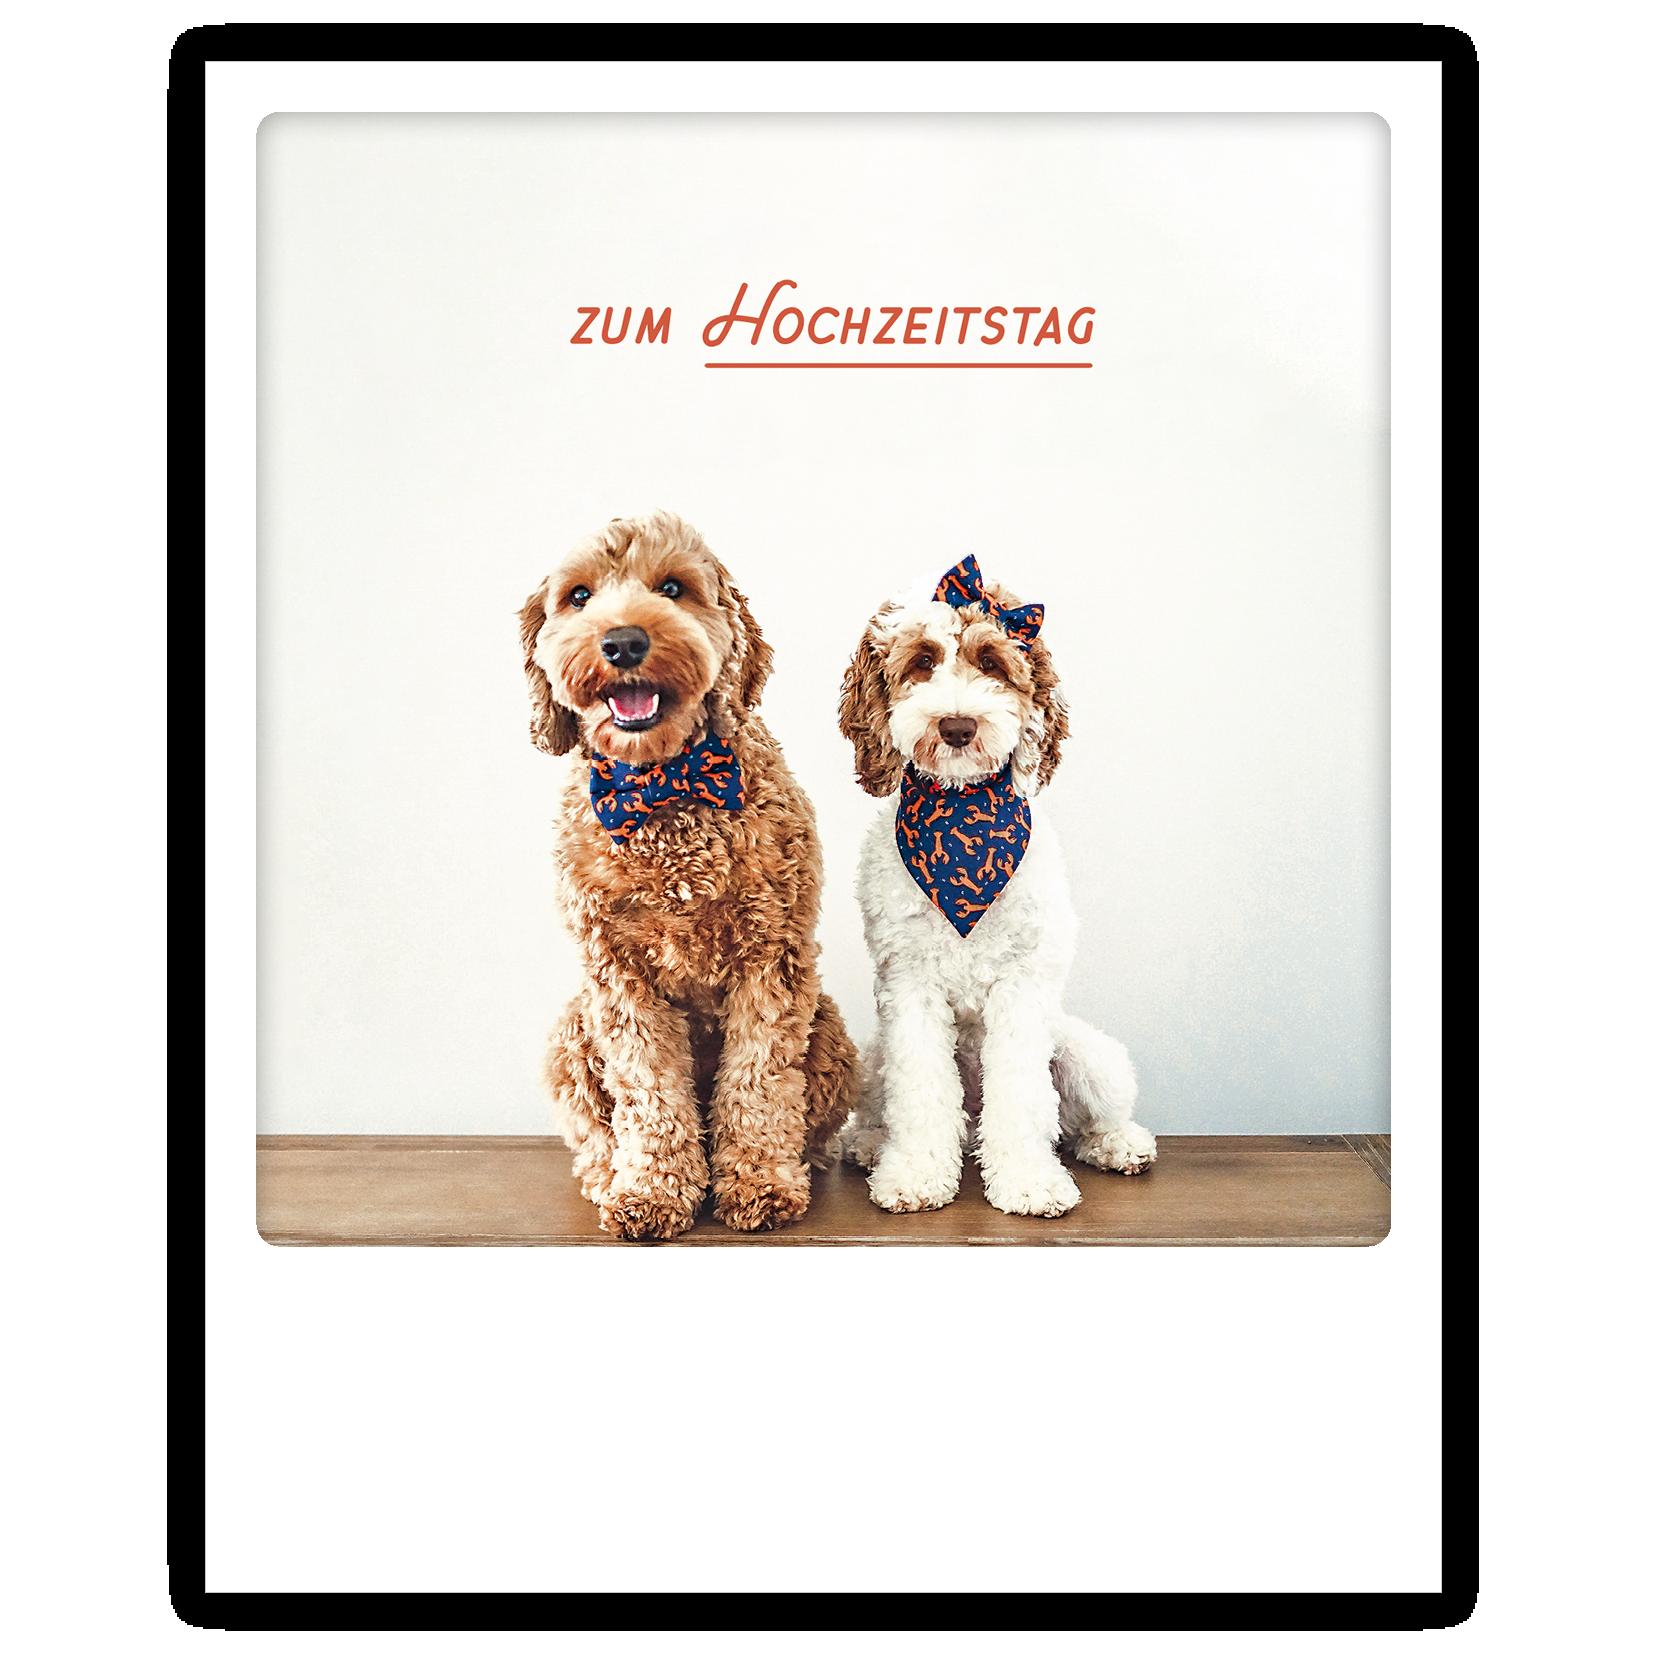 "Photo-Postkarte ""Zum Hochzeitstag"" - ZG 0799 - DE - Pickmotion"